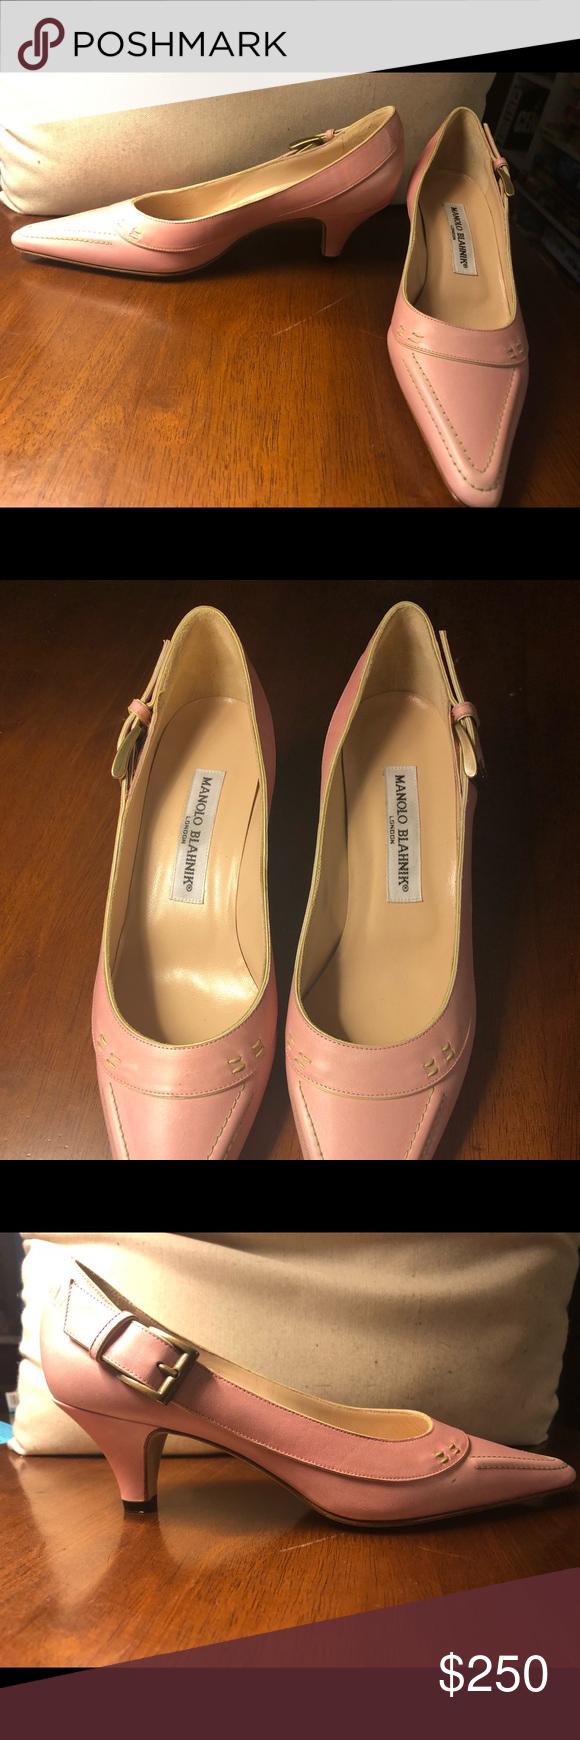 Manolo Blahnik Pale Pink Kitten Heels Pink Kitten Heels Manolo Blahnik Manolo Blahnik Shoes